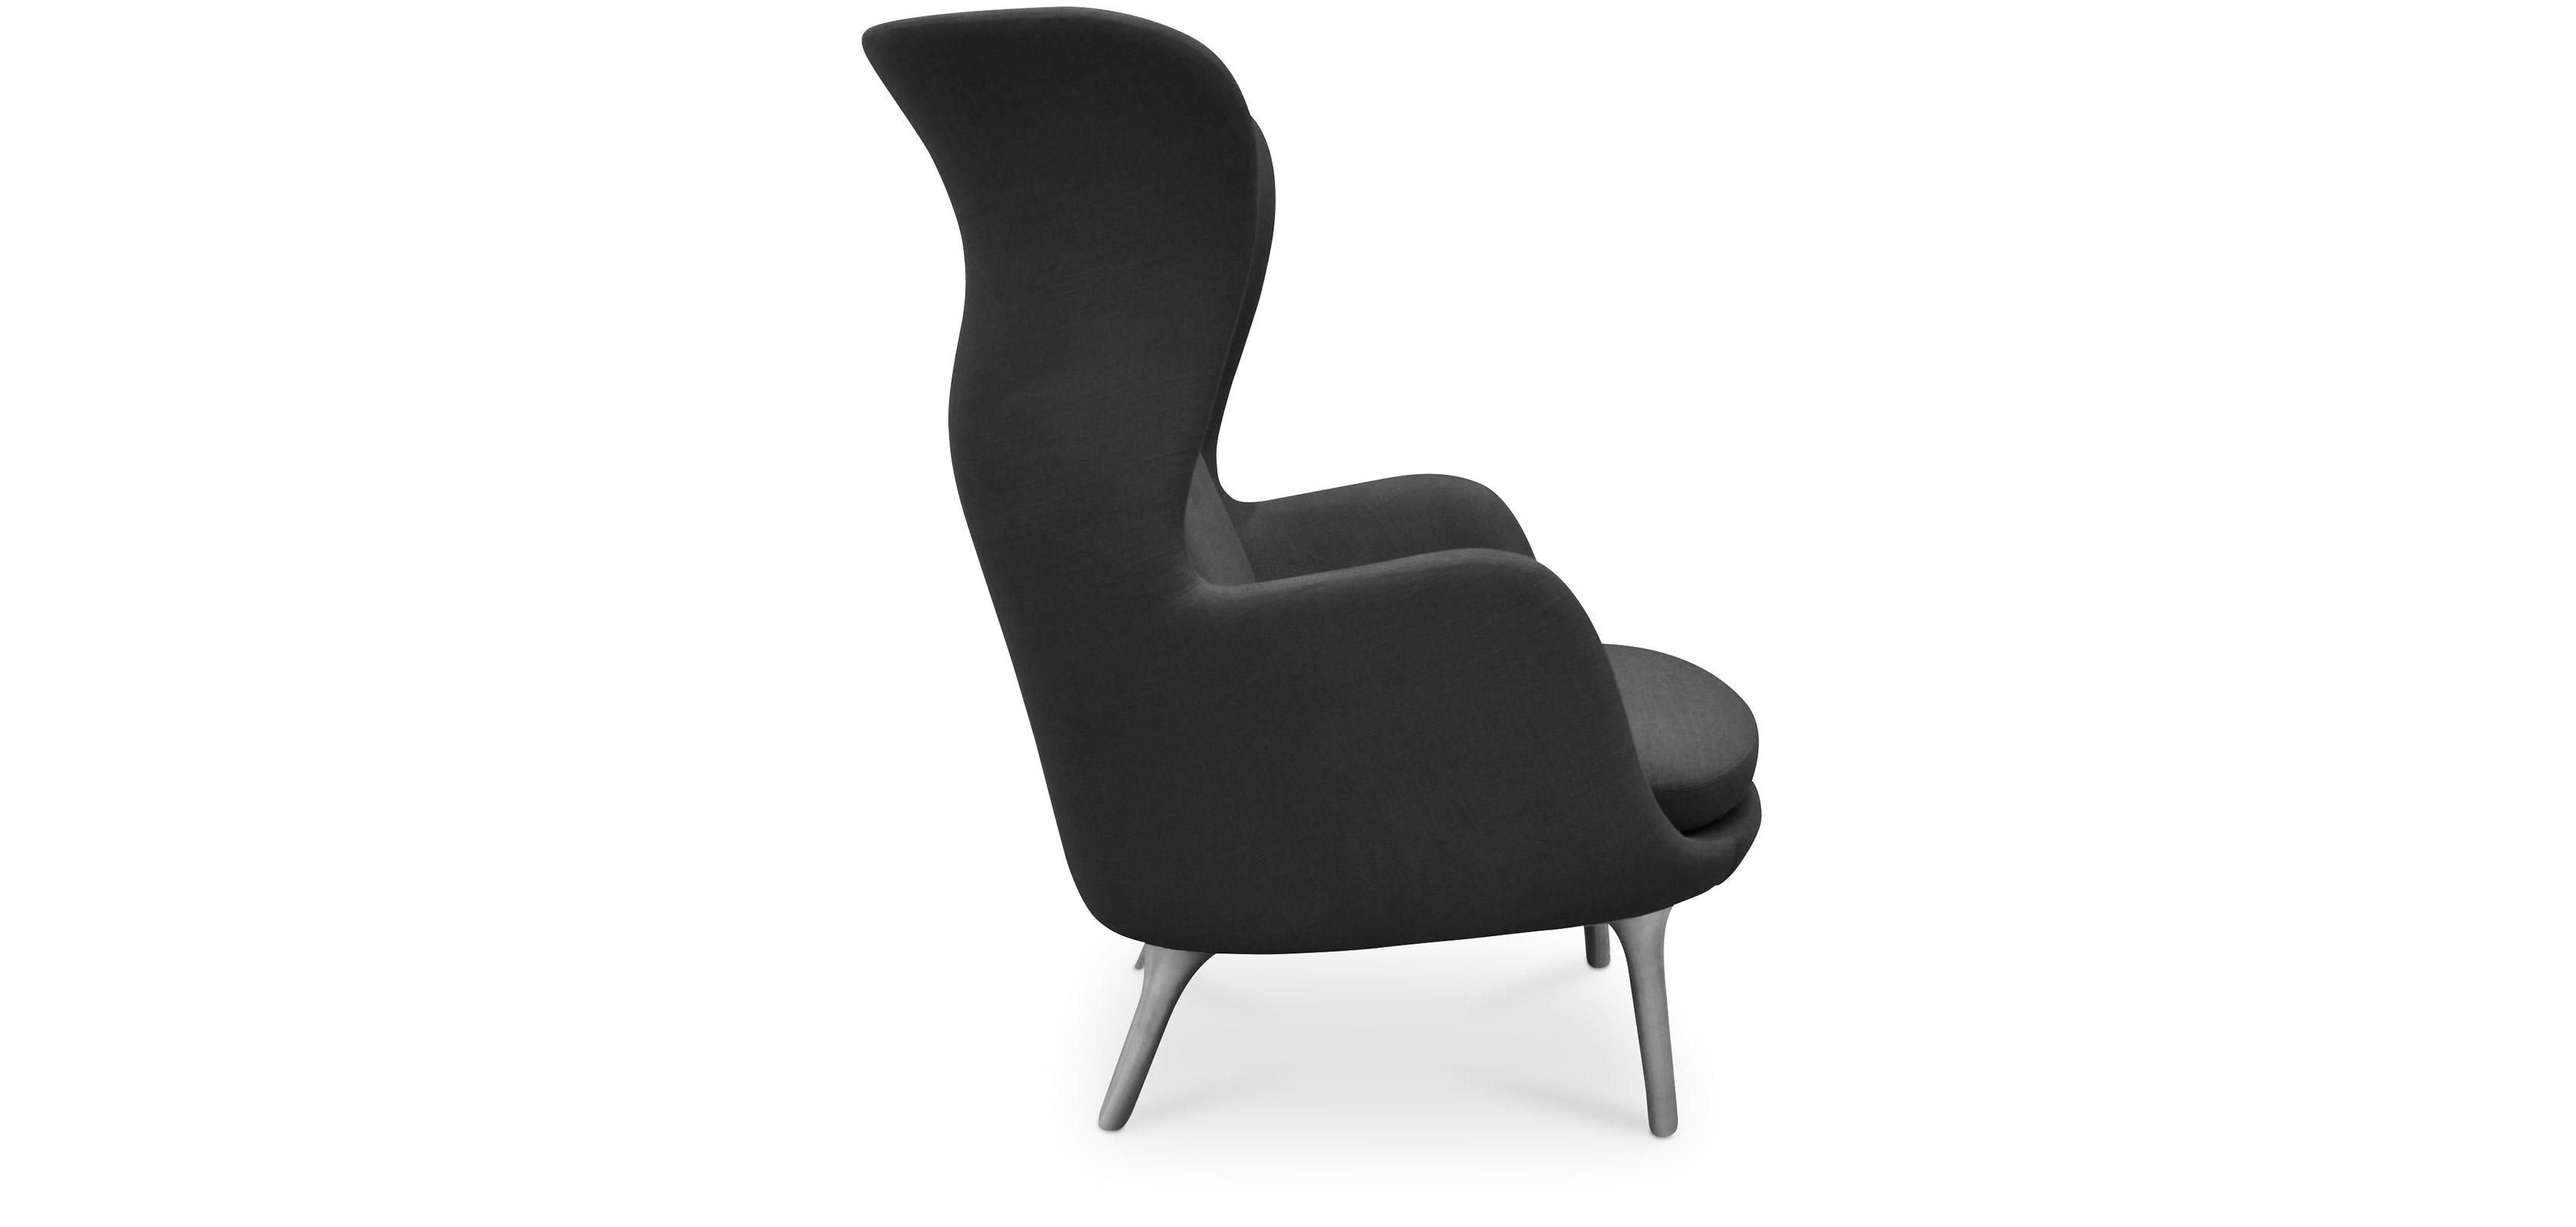 Skandinavisches design ro sessel jaime hayon style stoff - Sessel skandinavisches design ...